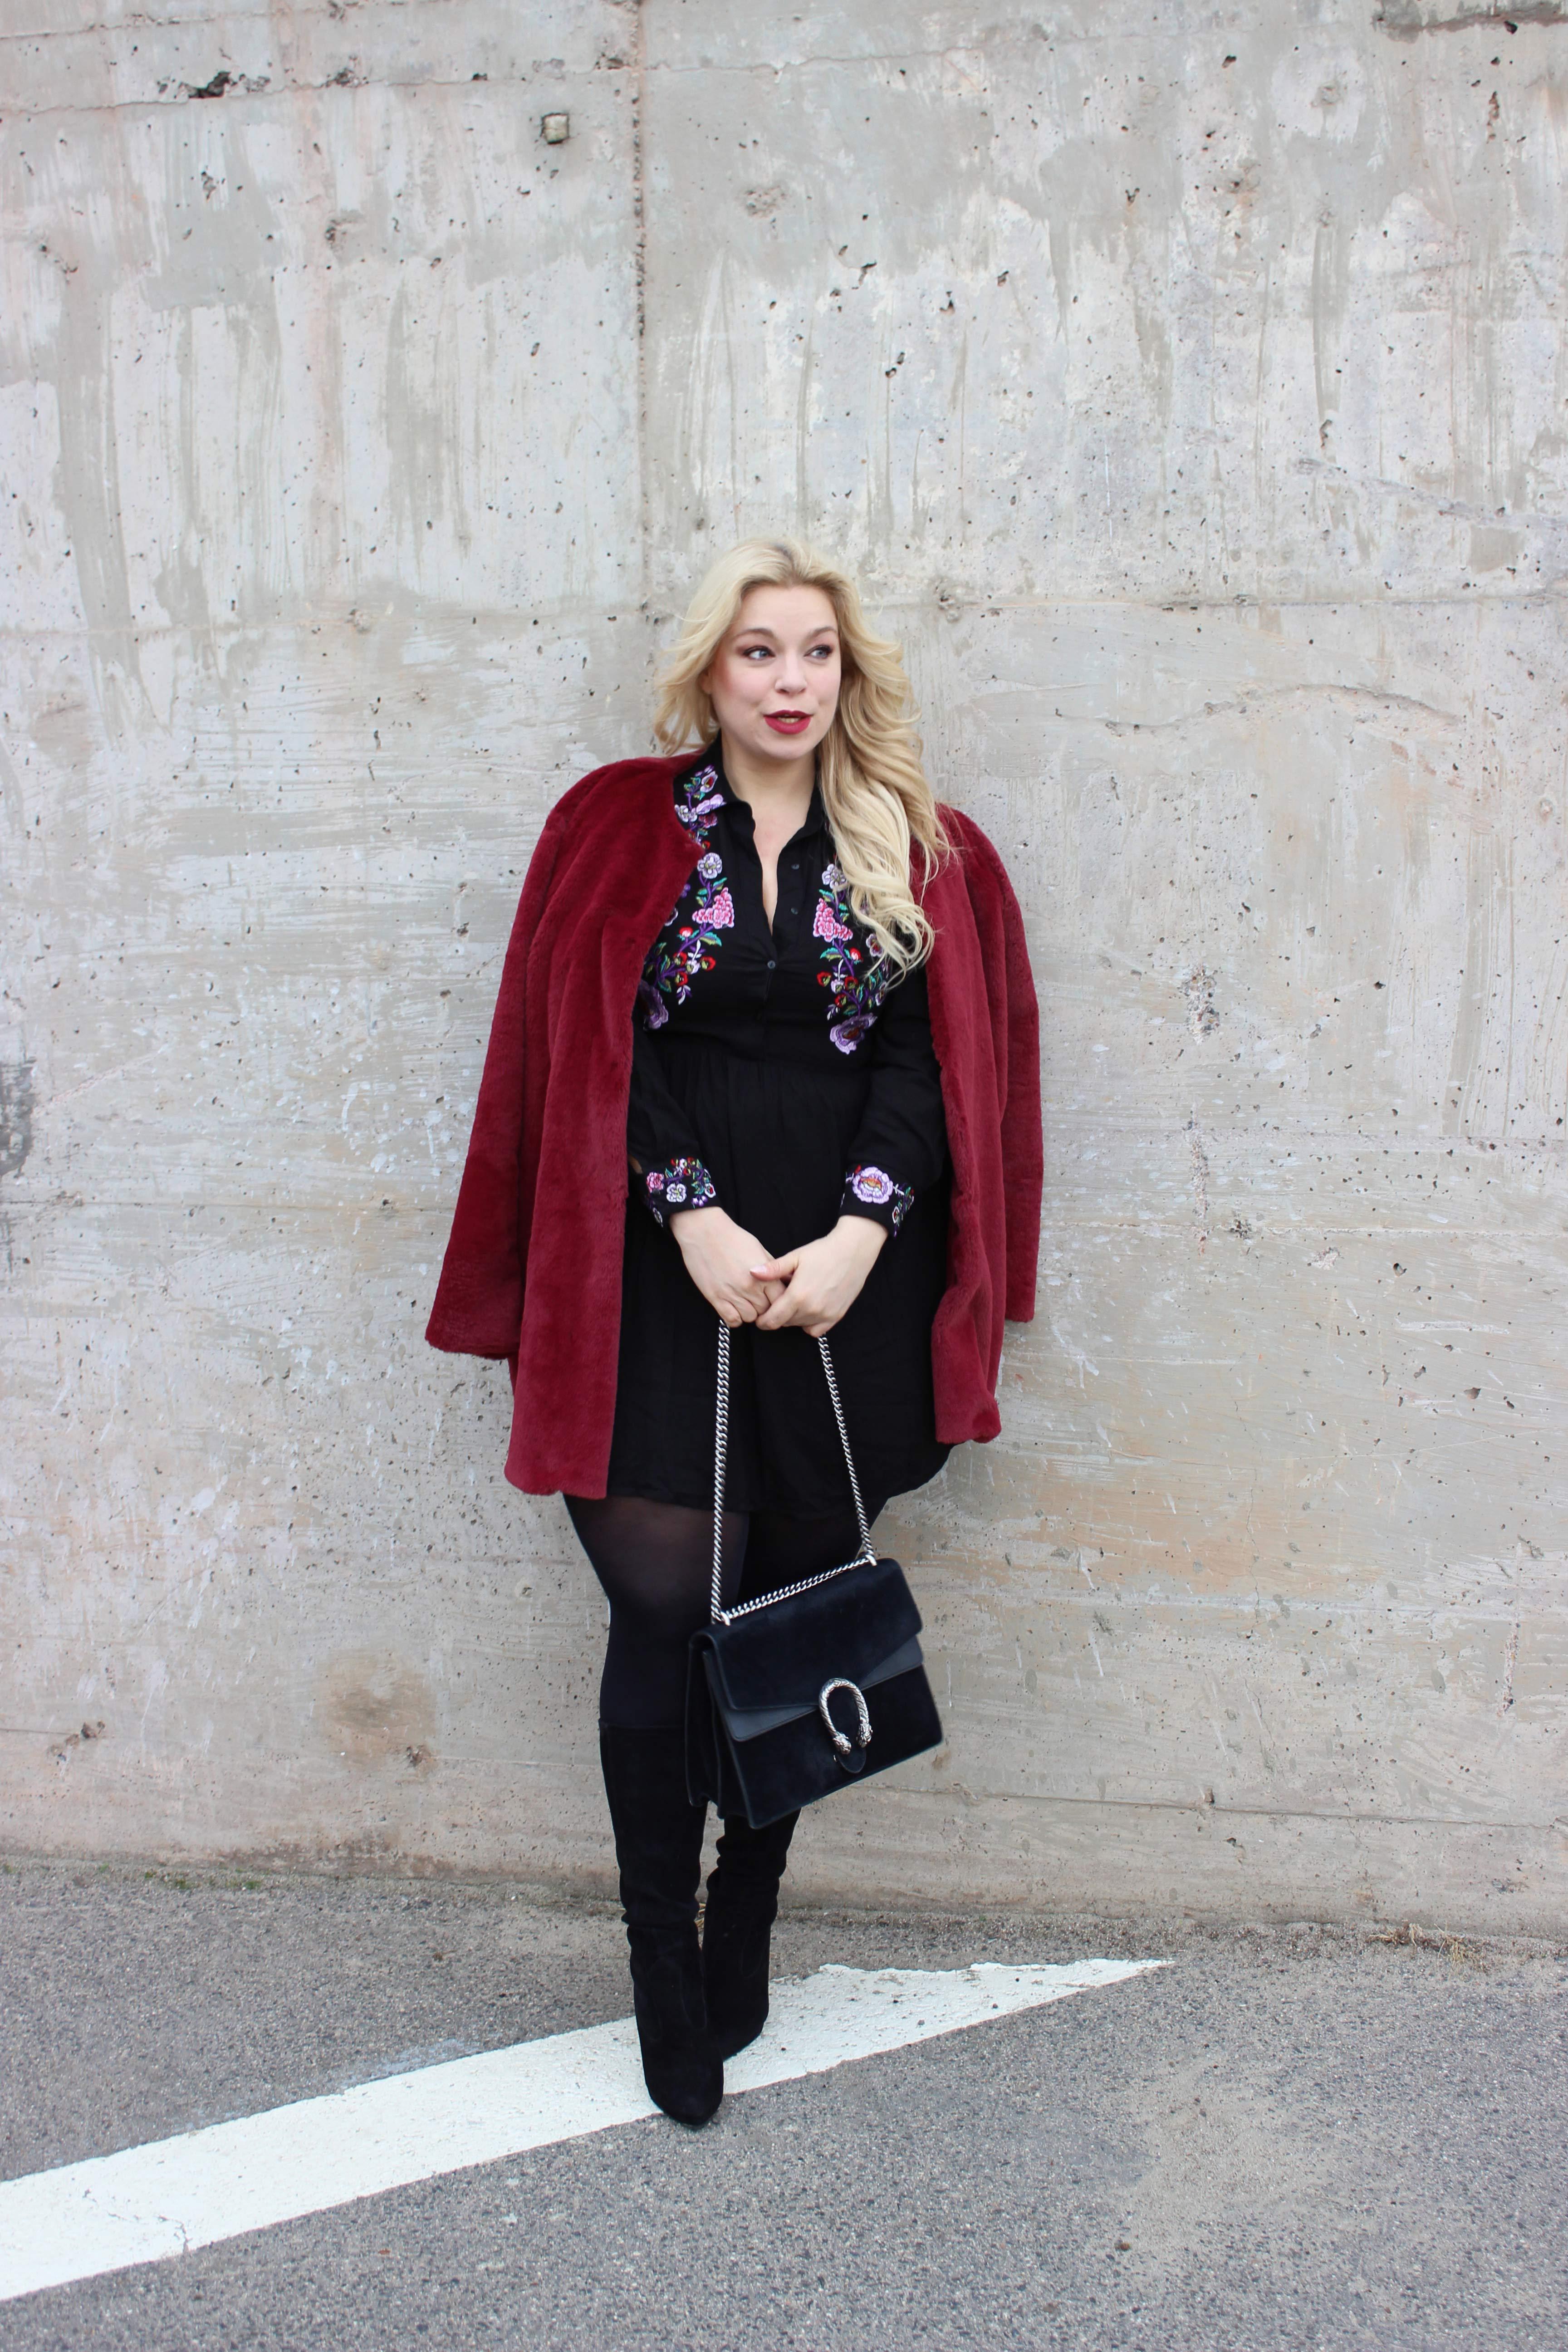 Caterina-pogorzelski-Wundercurves-Curvy-Plussize